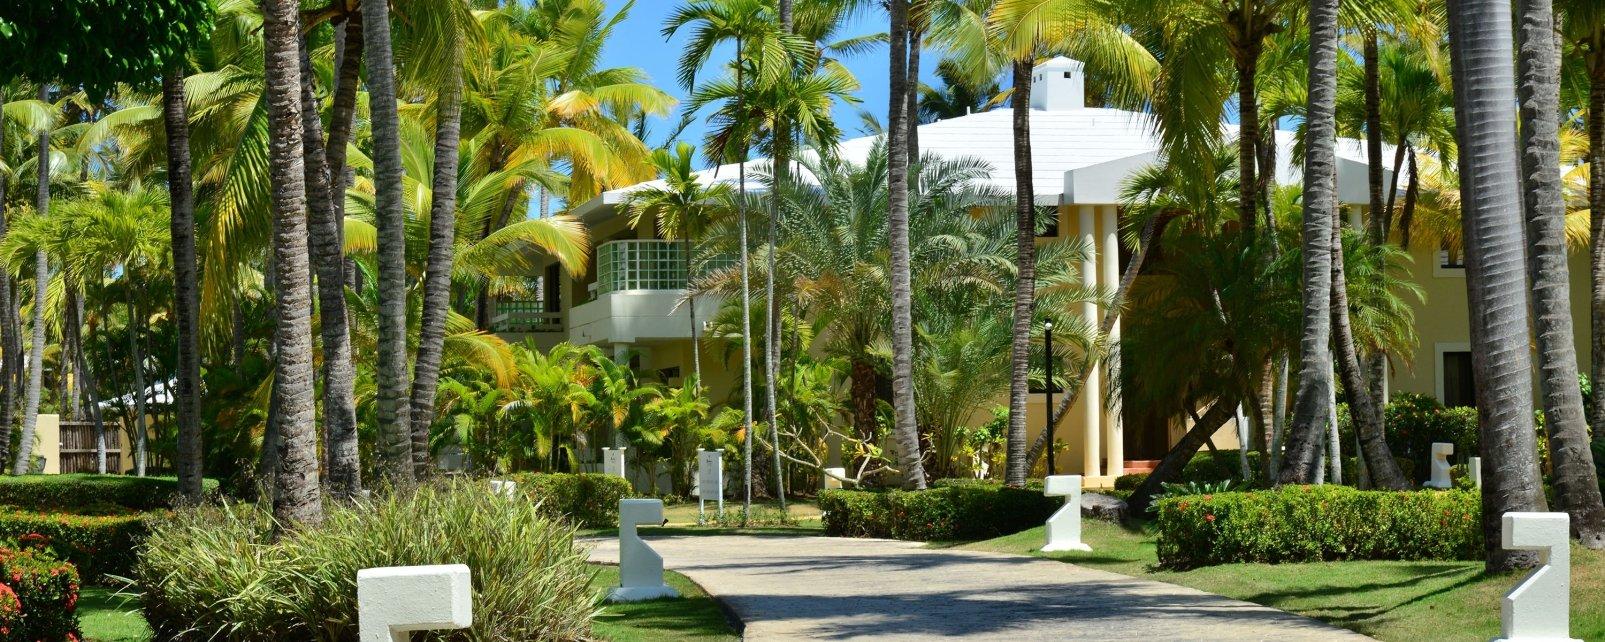 Hôtel Melia Punta Cana Beach